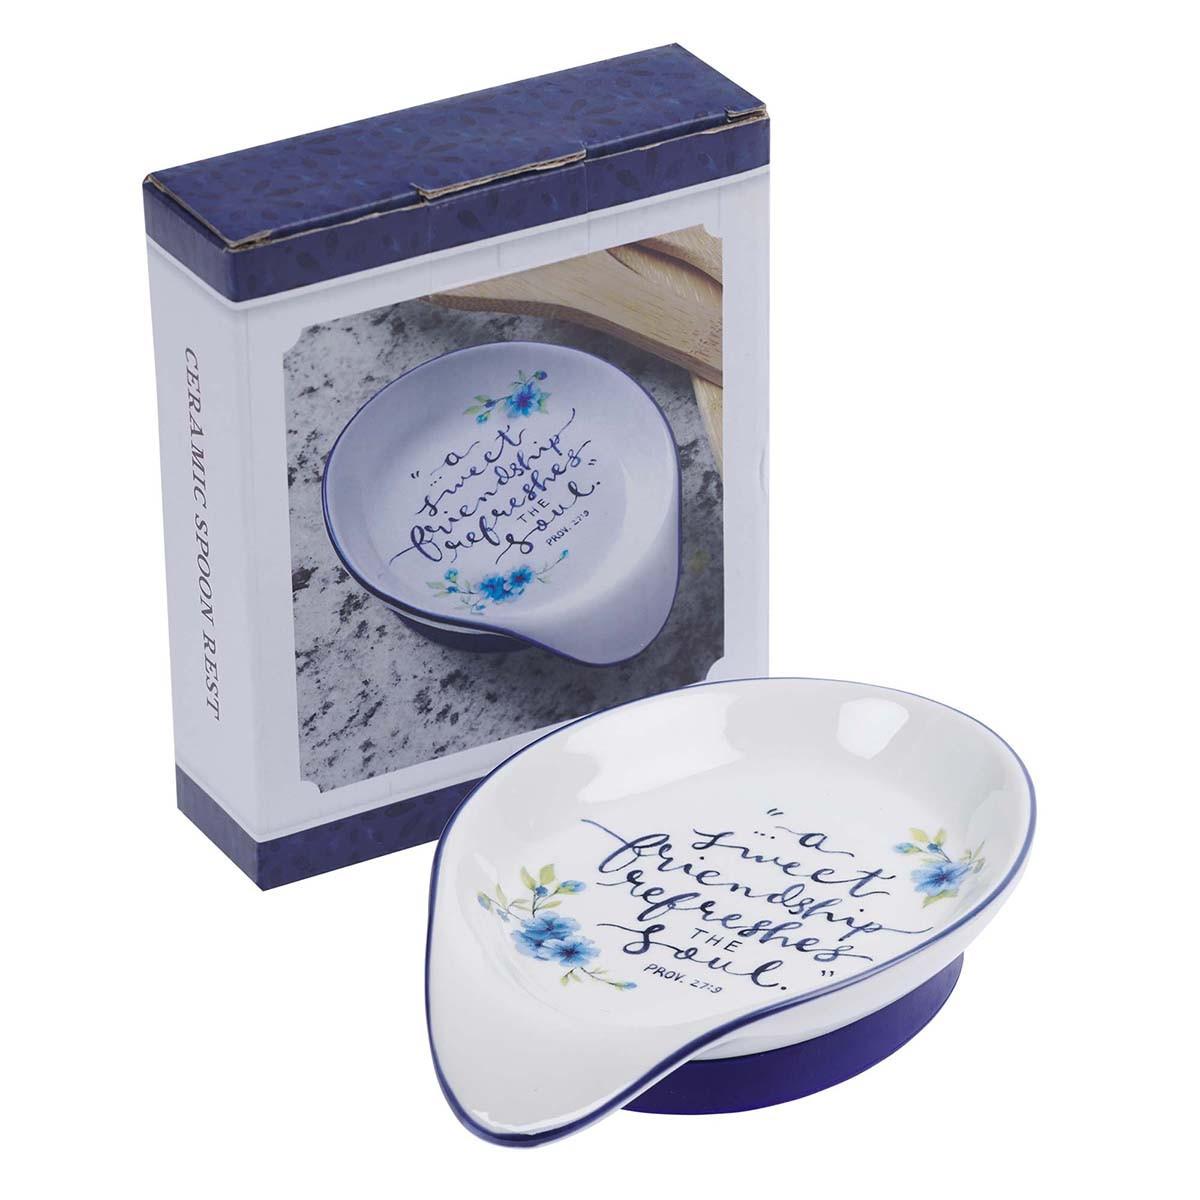 Sweet Friendship Ceramic Spoon Rest Proverbs 27 9